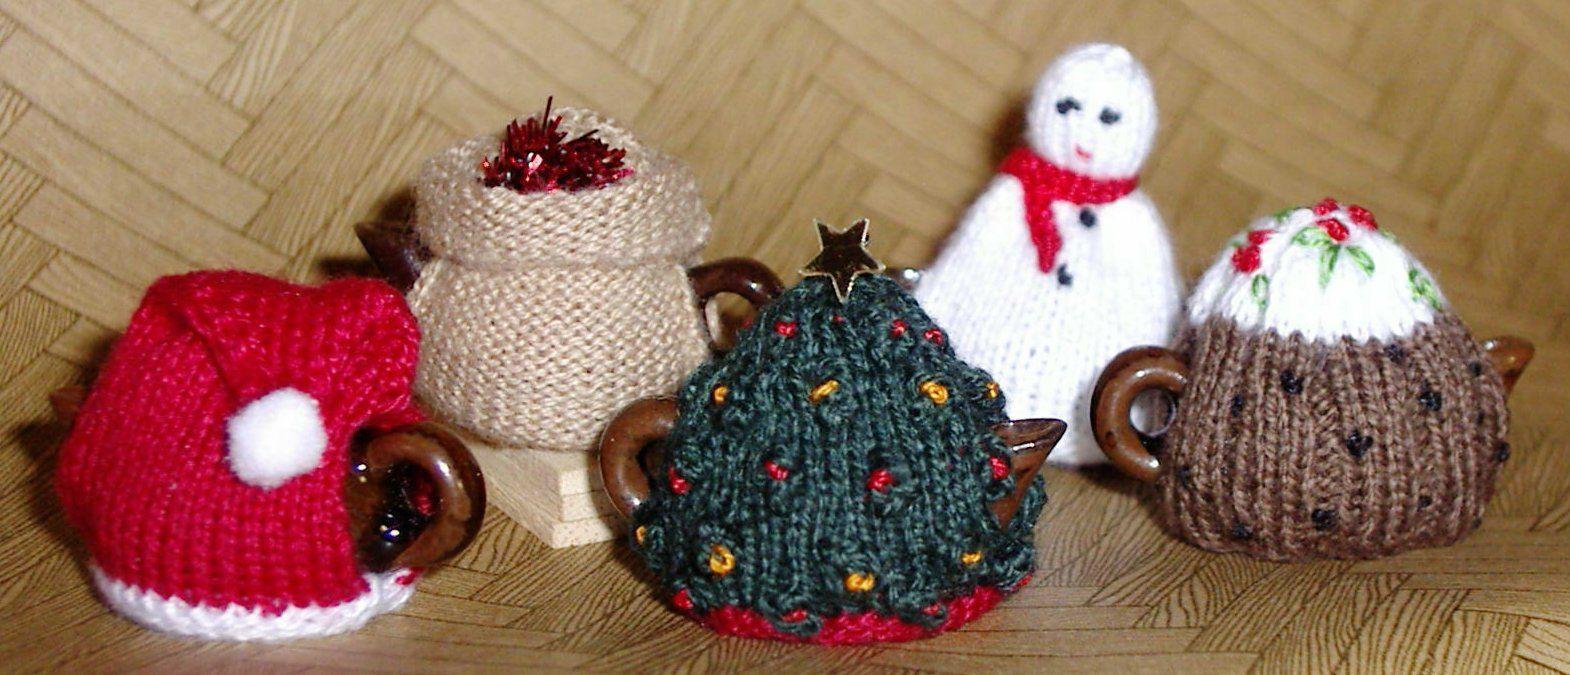 Free Knitting Pattern - Tea Cosy | Knitted tea cosies, Tea ...